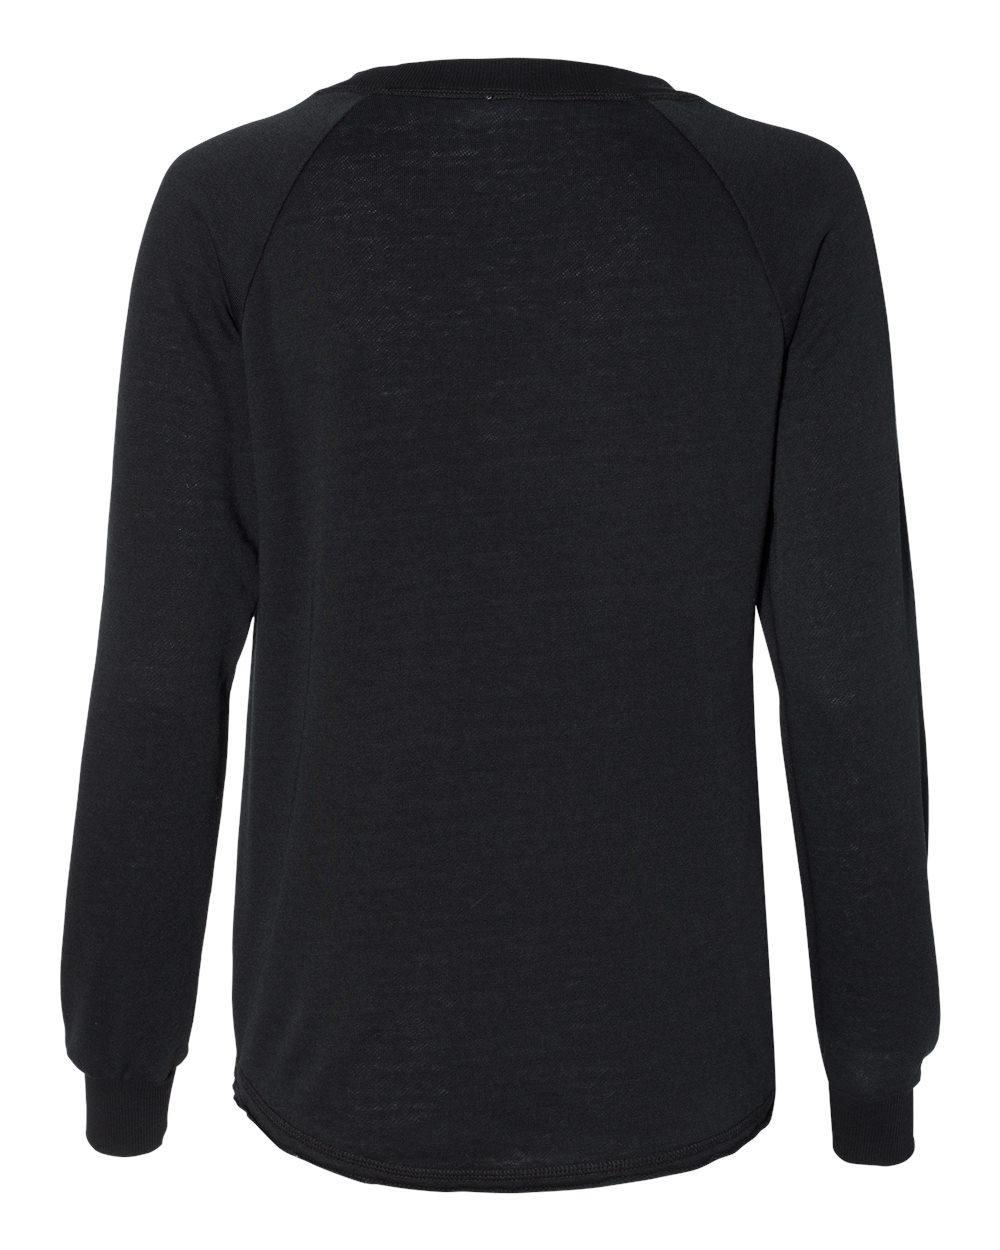 Alternative-Women-s-Lazy-Day-Burnout-French-Terry-LightSweatshirt-8626-up-to-XL thumbnail 13